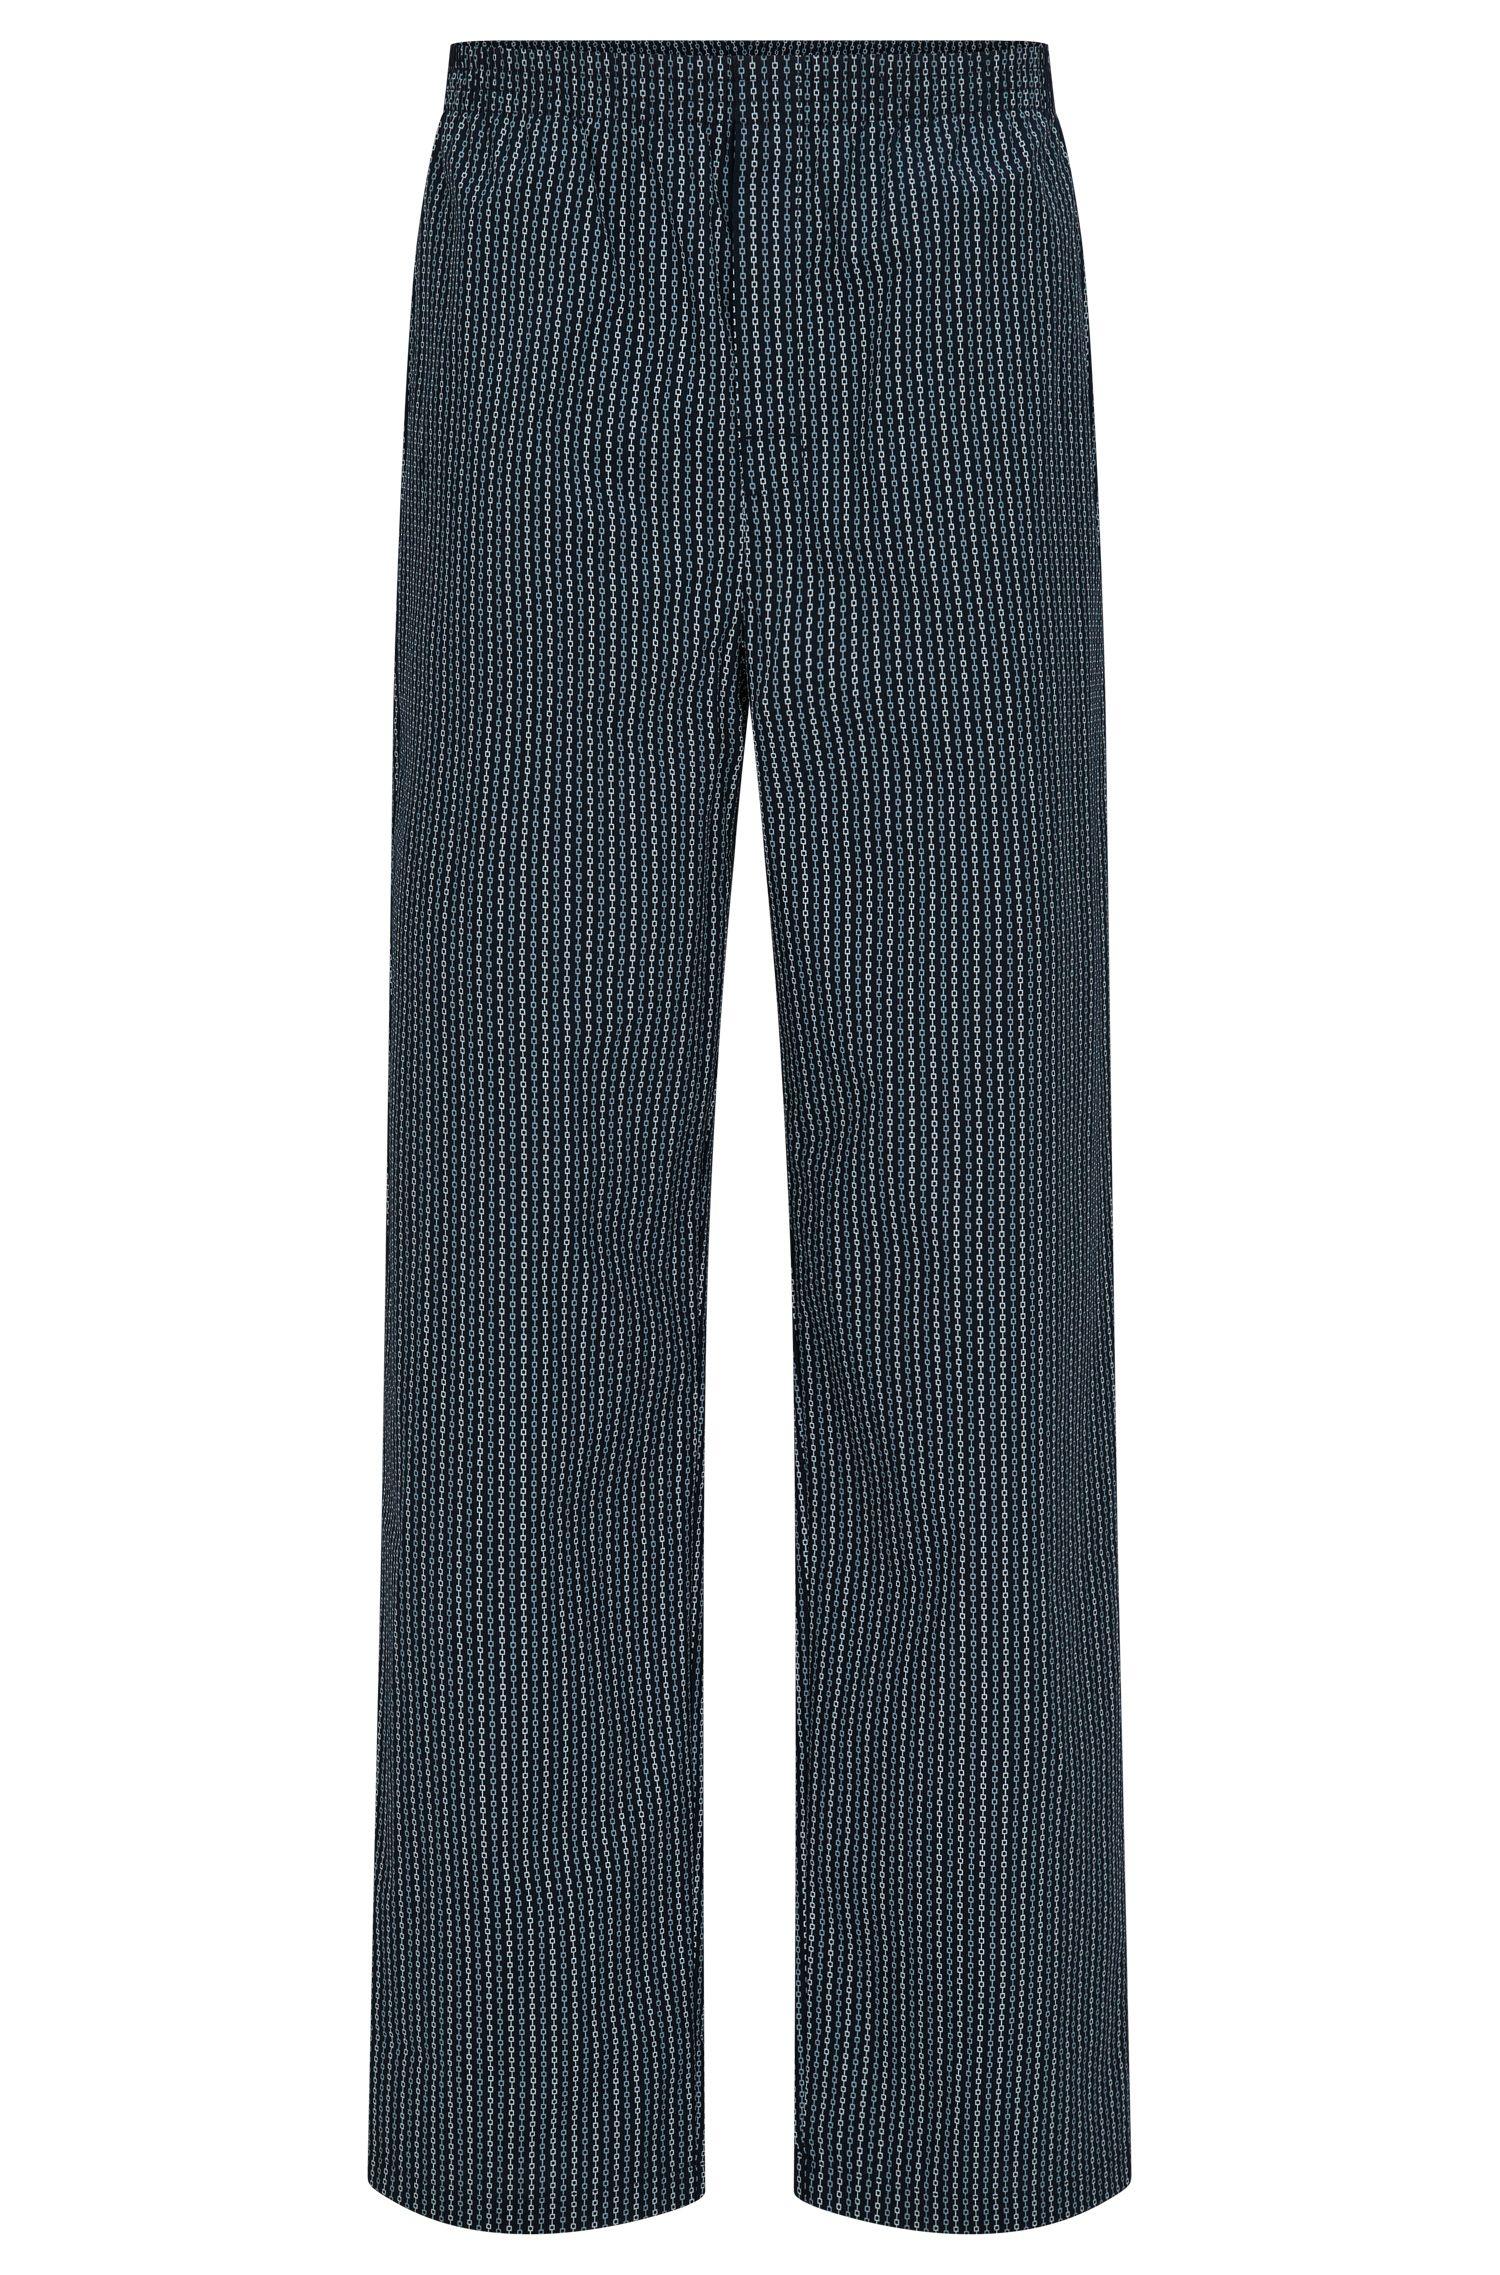 Pantalon de pyjama en coton à motif intégral: «Long Pant CW»